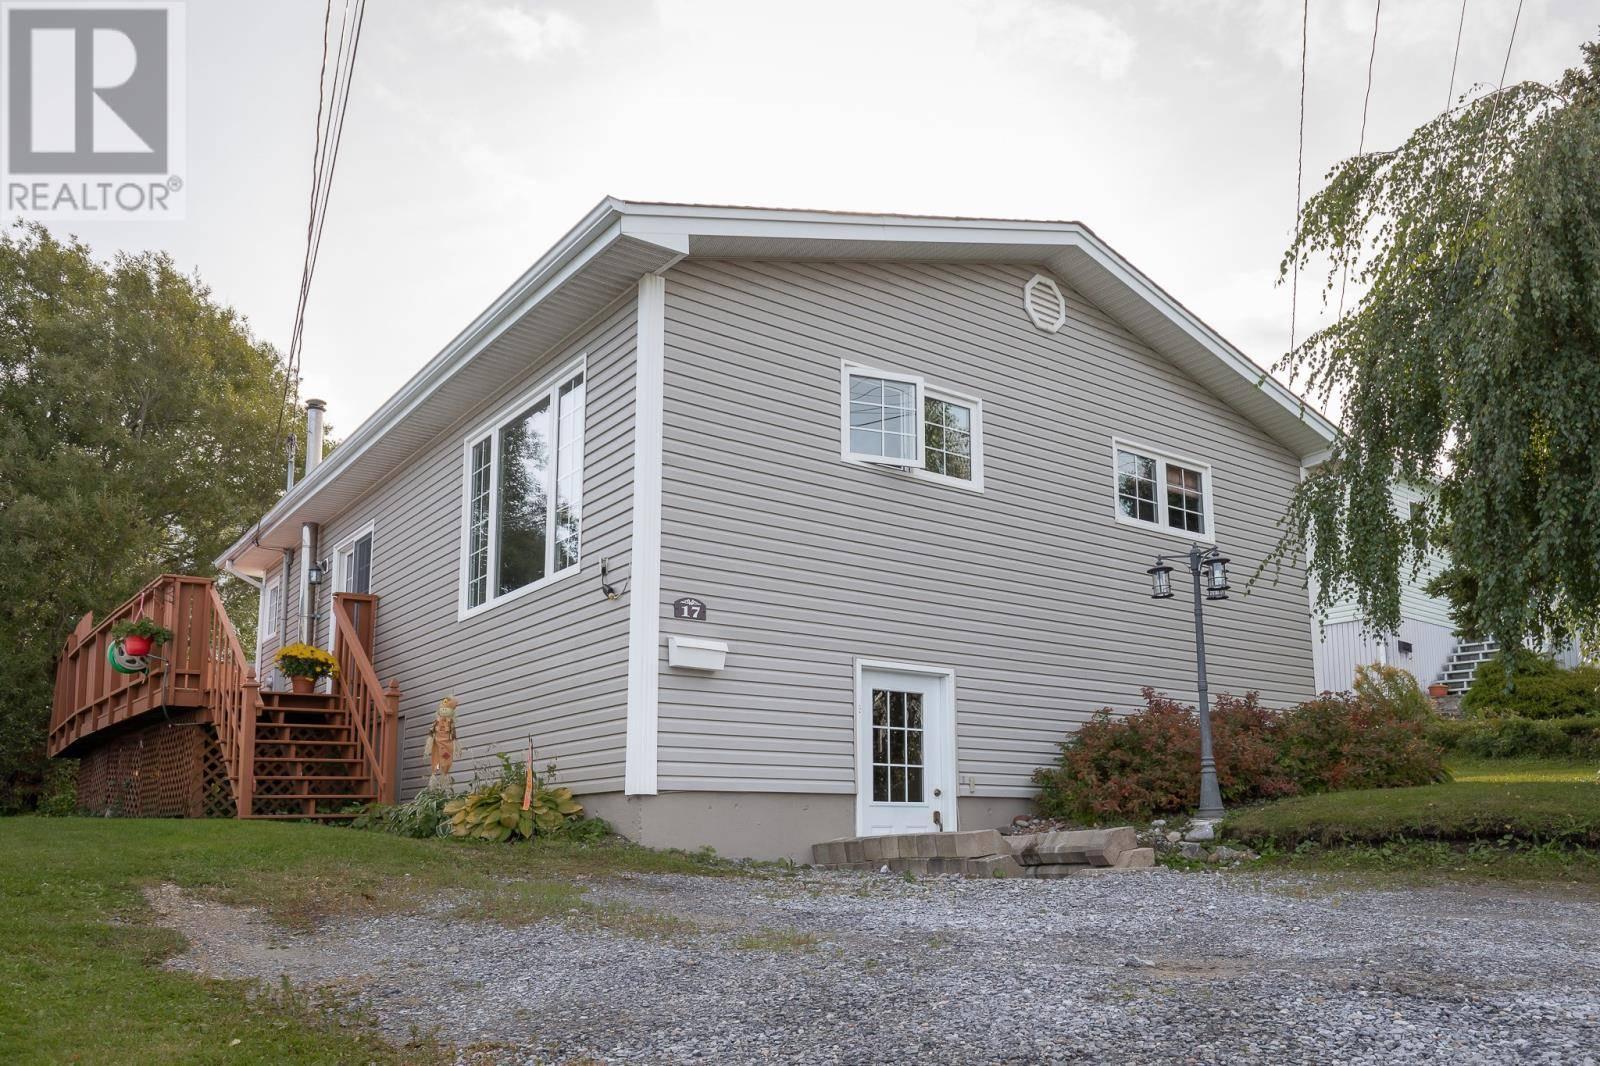 House for sale at 17 Empire St Corner Brook Newfoundland - MLS: 1184961